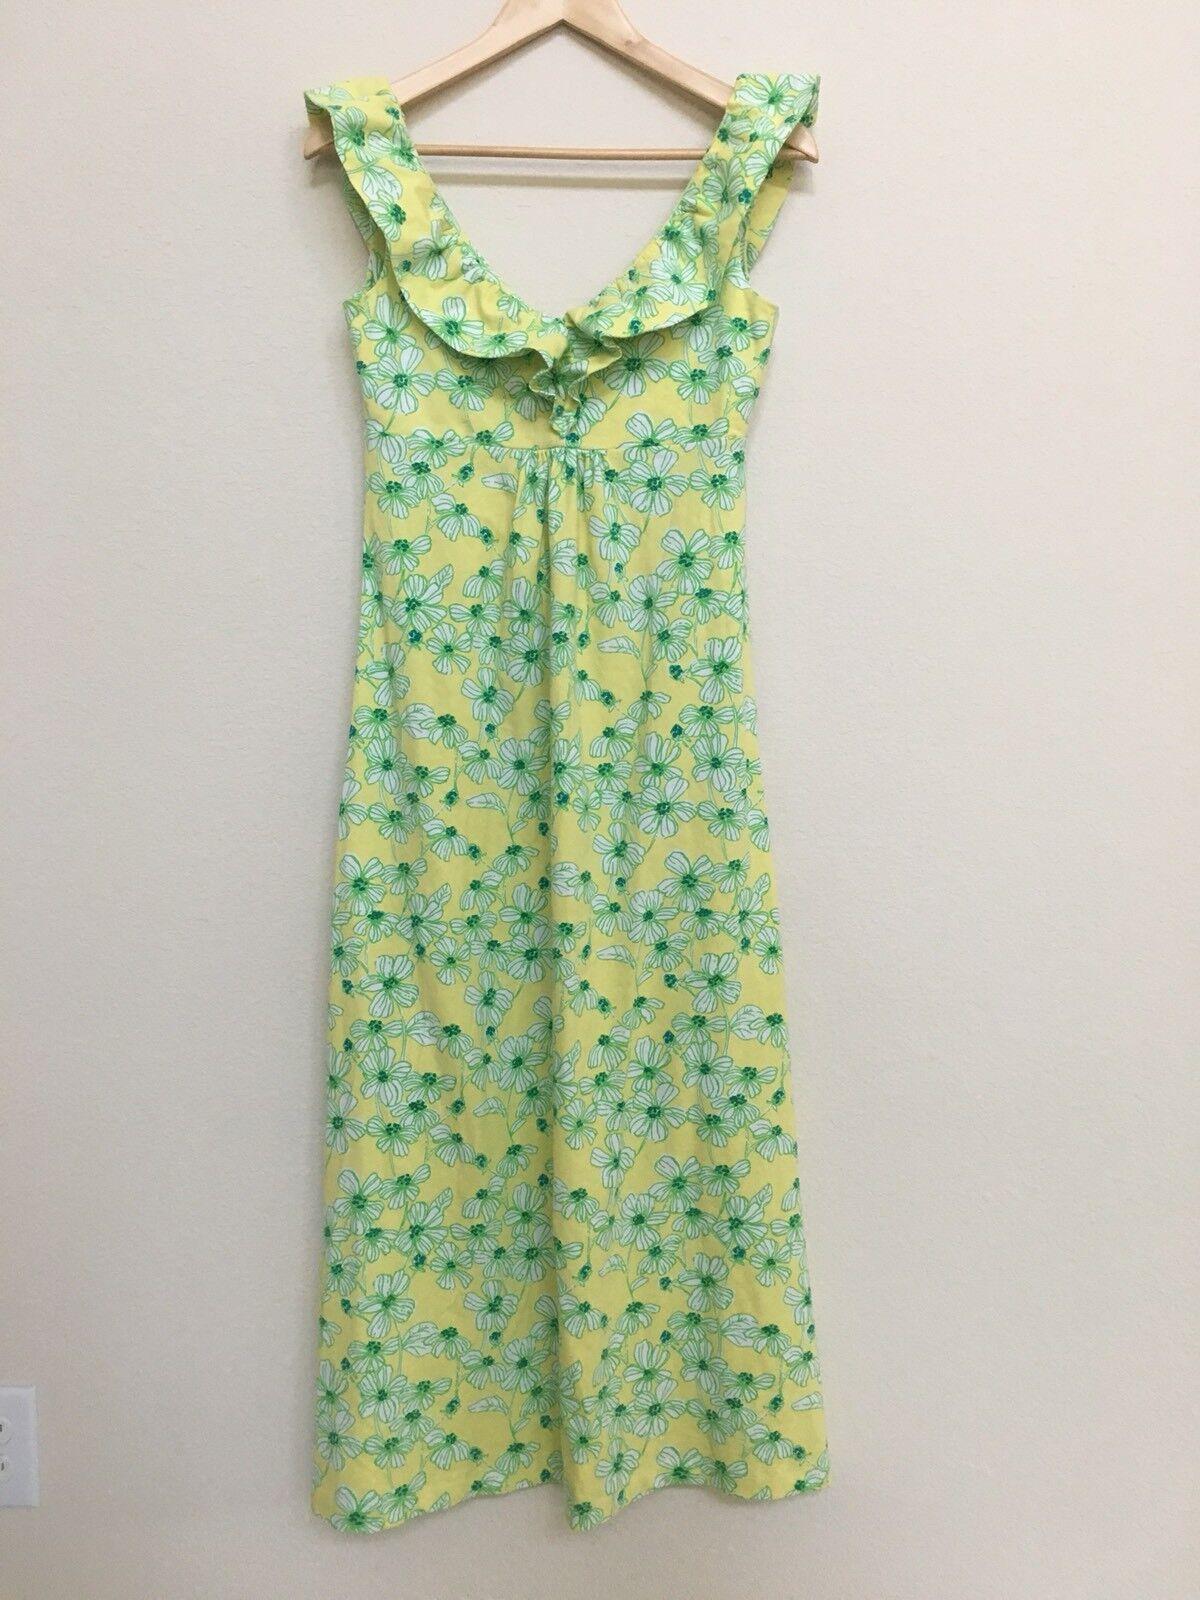 Lilly Pulitzer damen's XS Maxi Dress Grün & Gelb